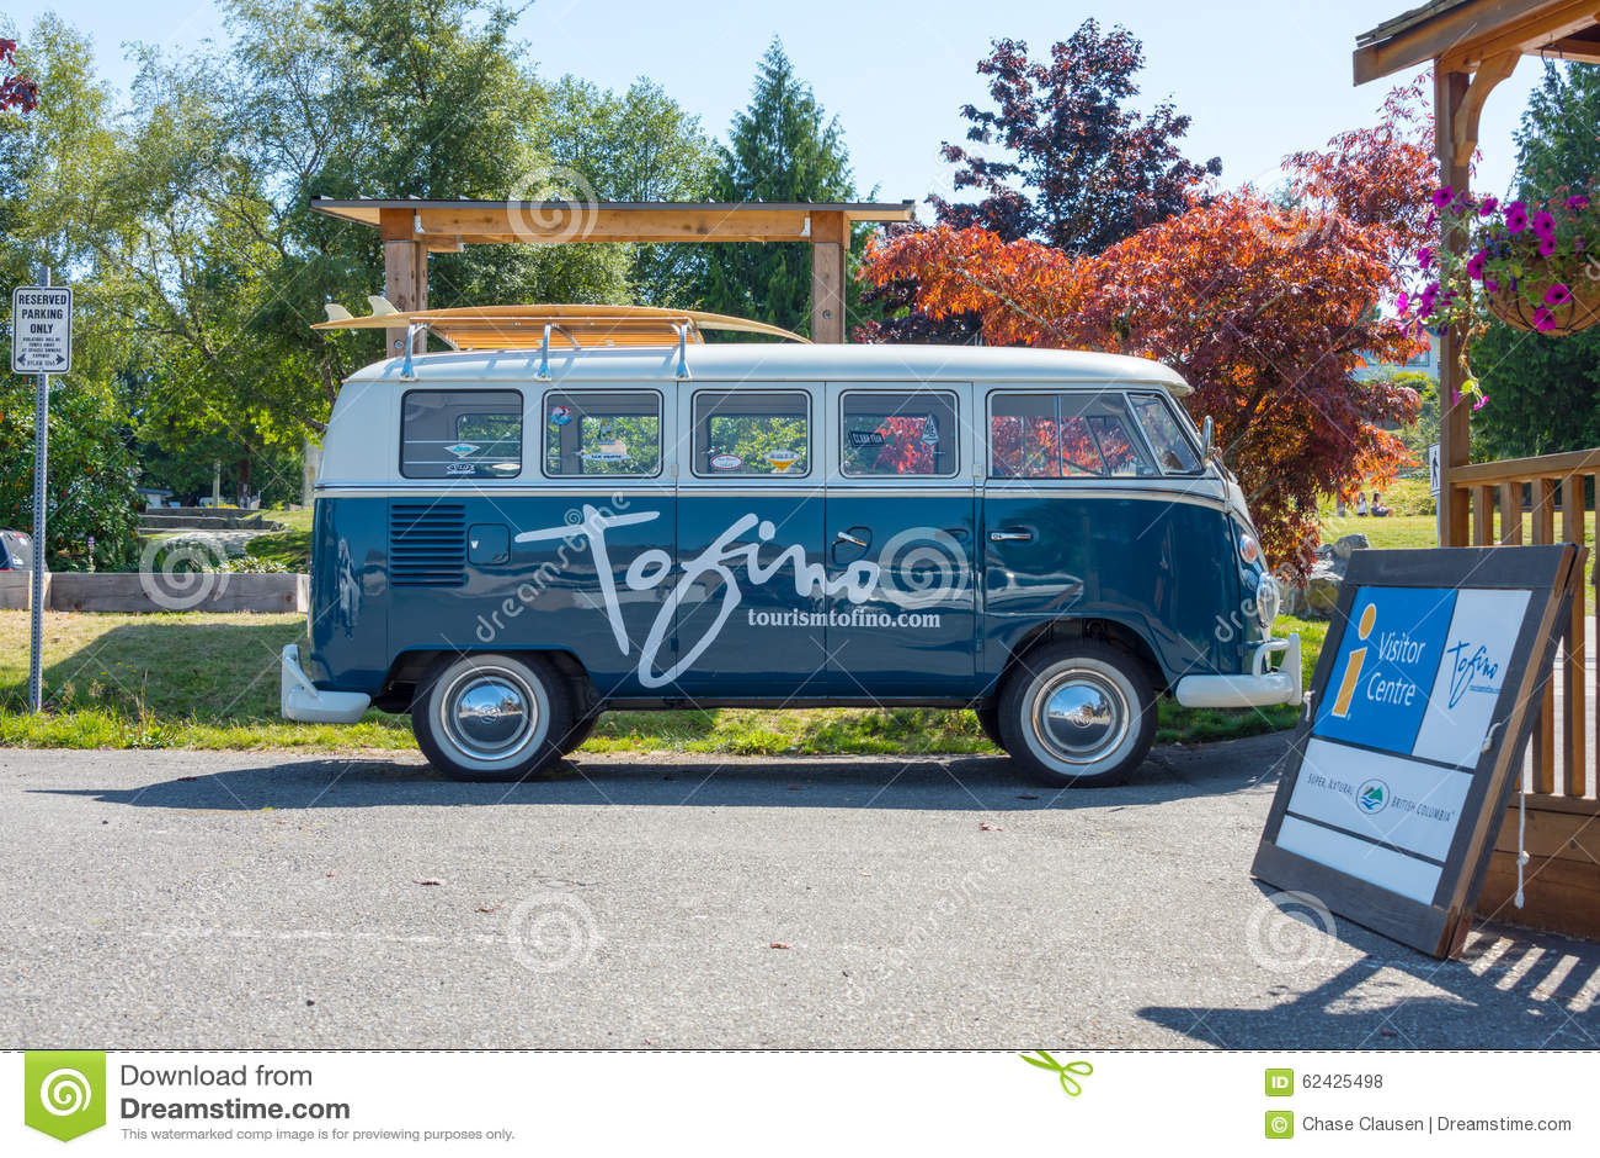 Used Vans Vancouver Island